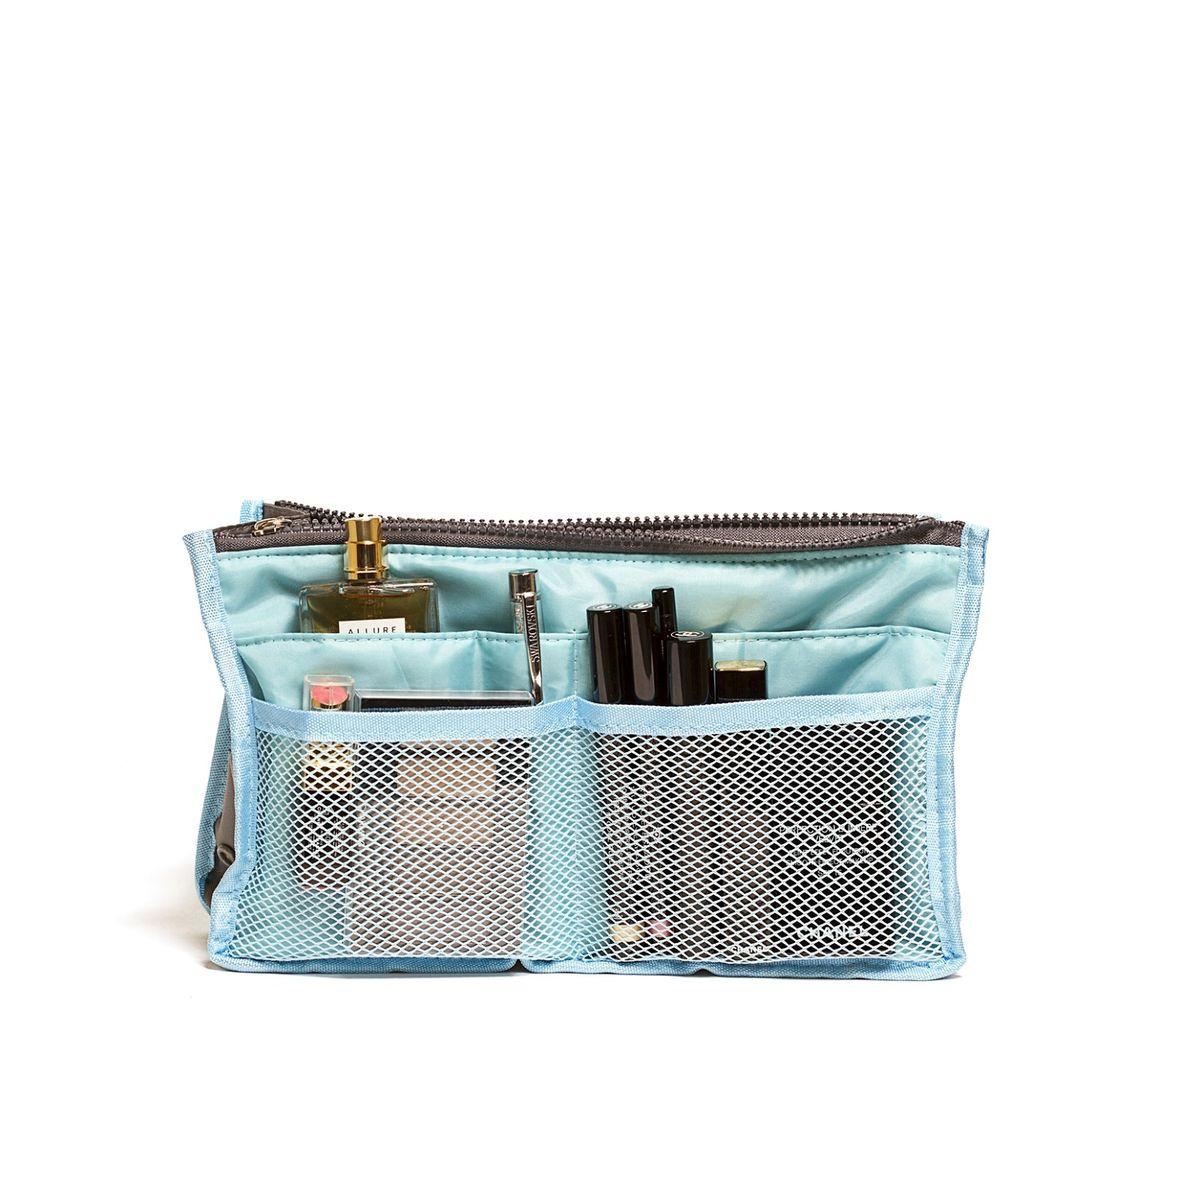 "Органайзер для сумки ""Homsu"", цвет: голубой, 30 x 8,5 x 18,5 см #1"